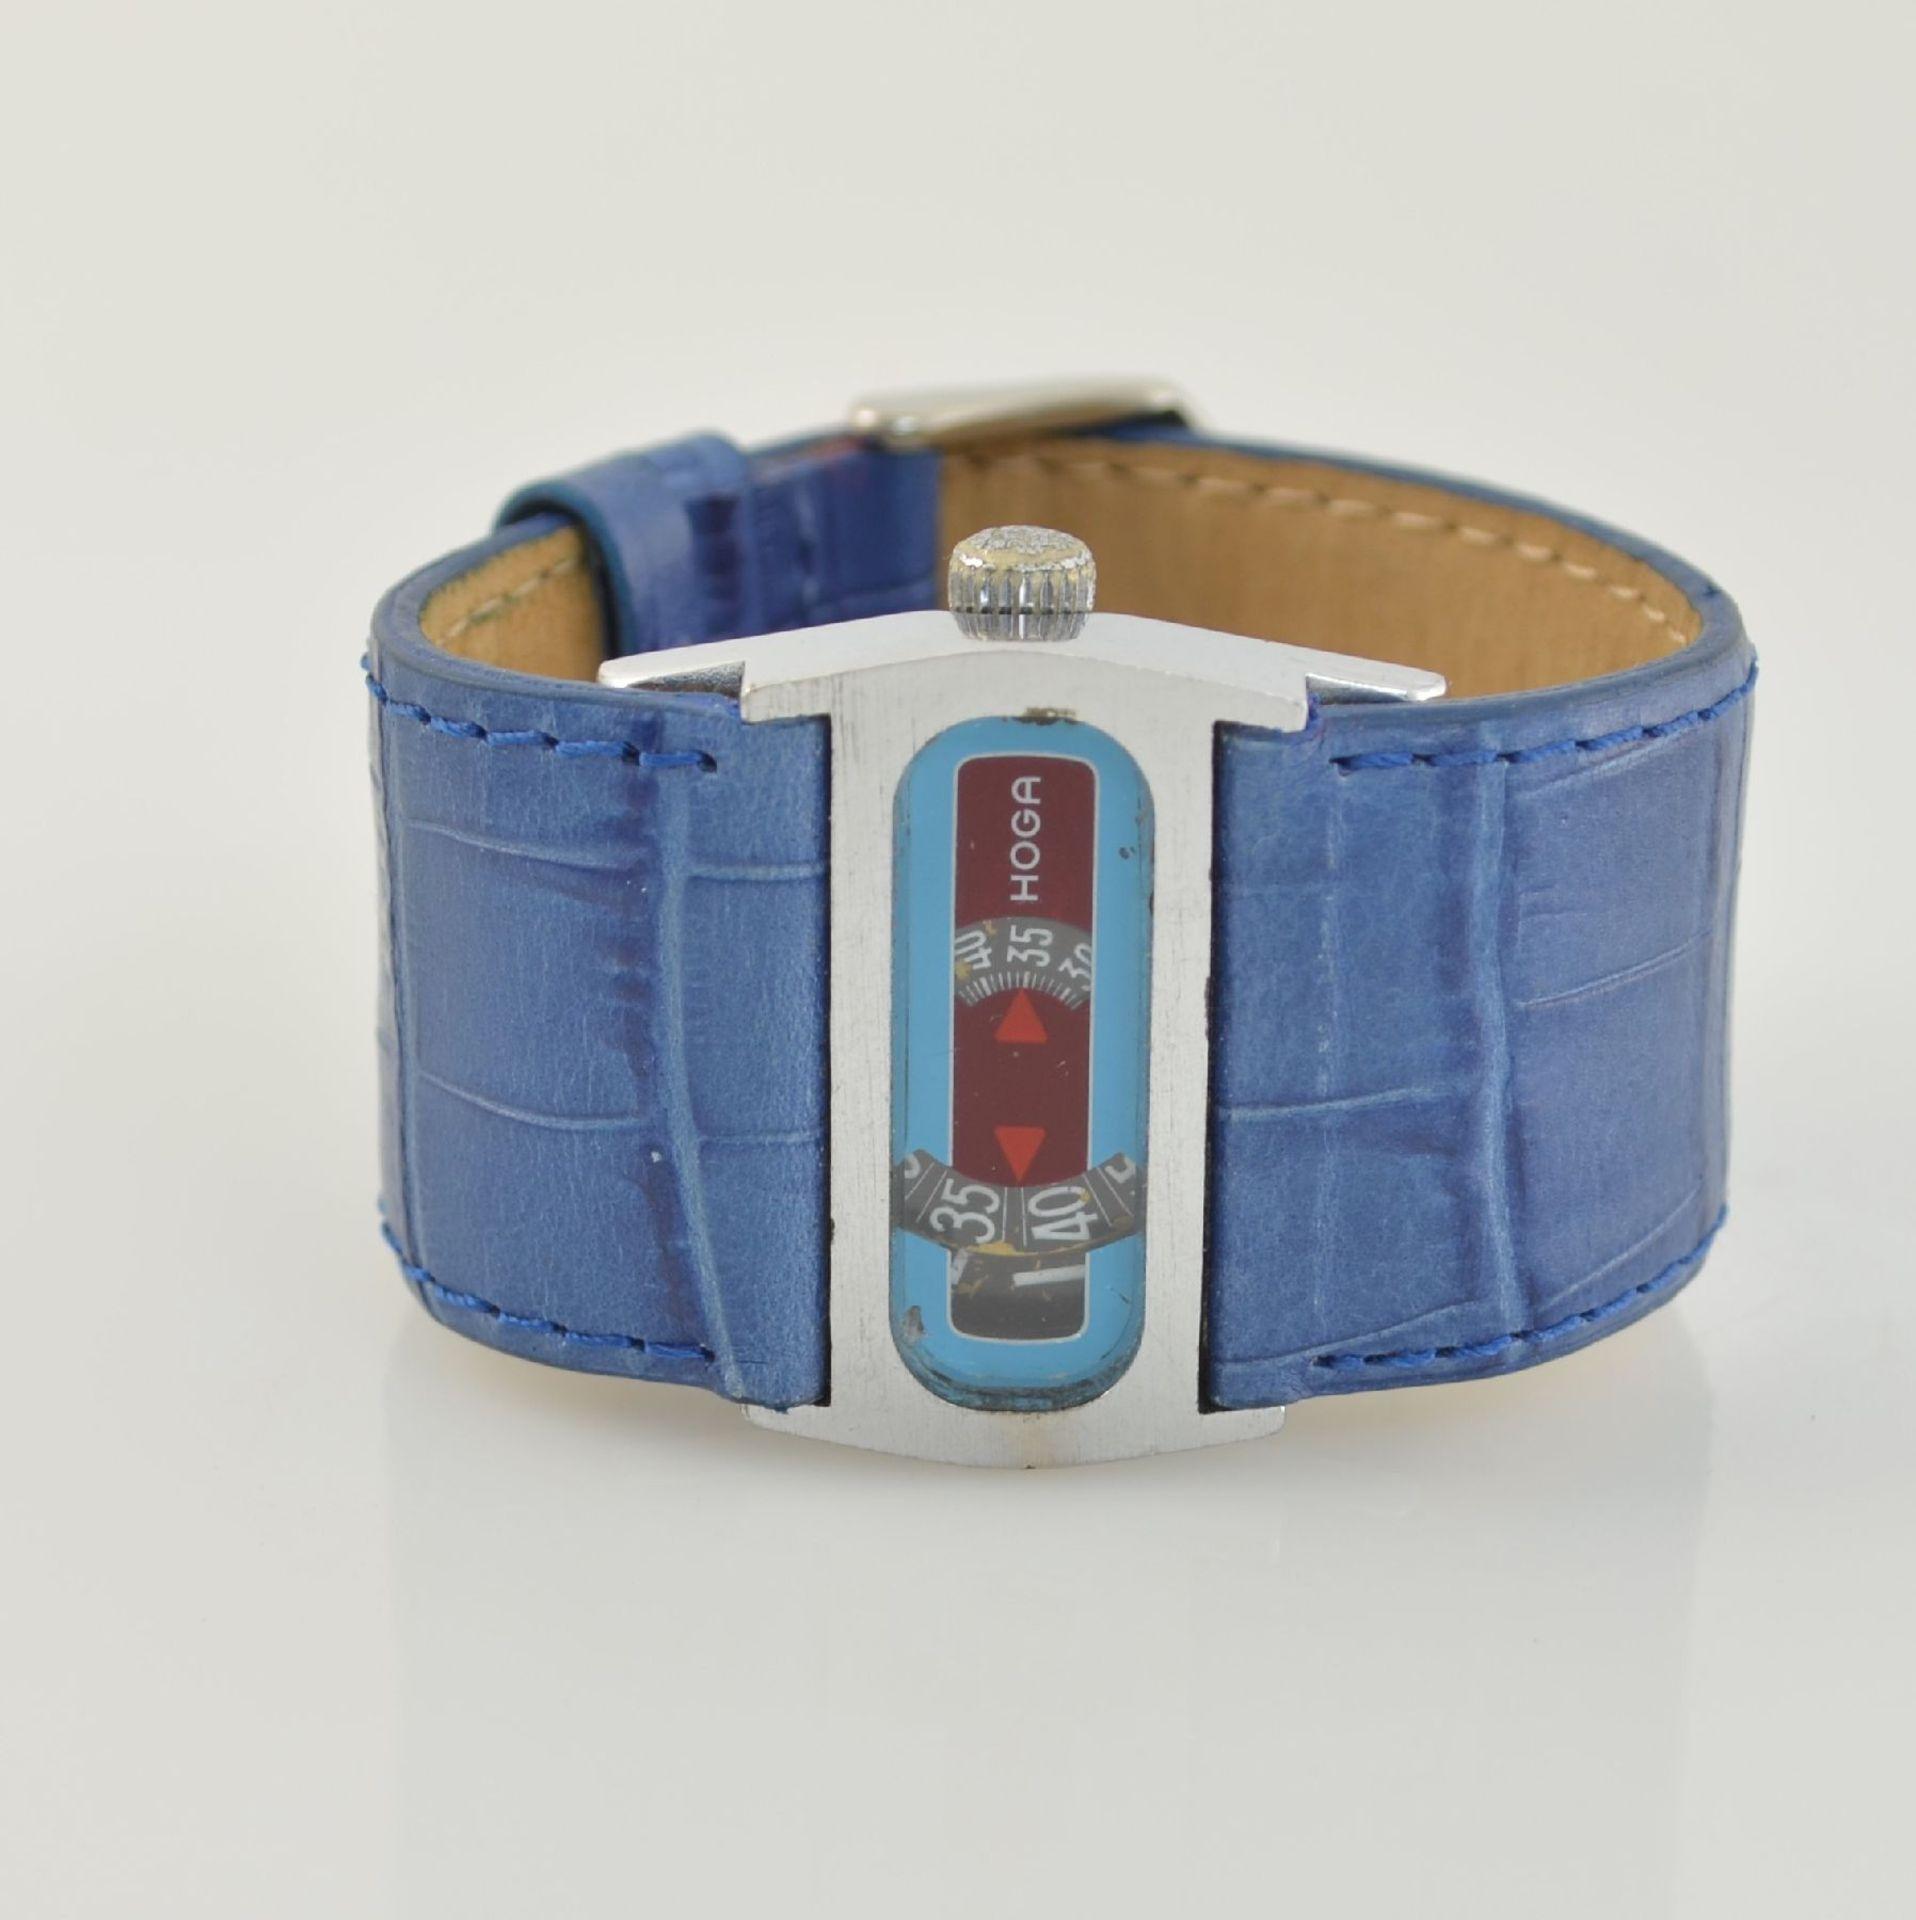 HOGA/Direct Time Armbanduhr mit digitaler Zeitanzeige Kal. AS 1902, Schweiz um 1970, Automatik,